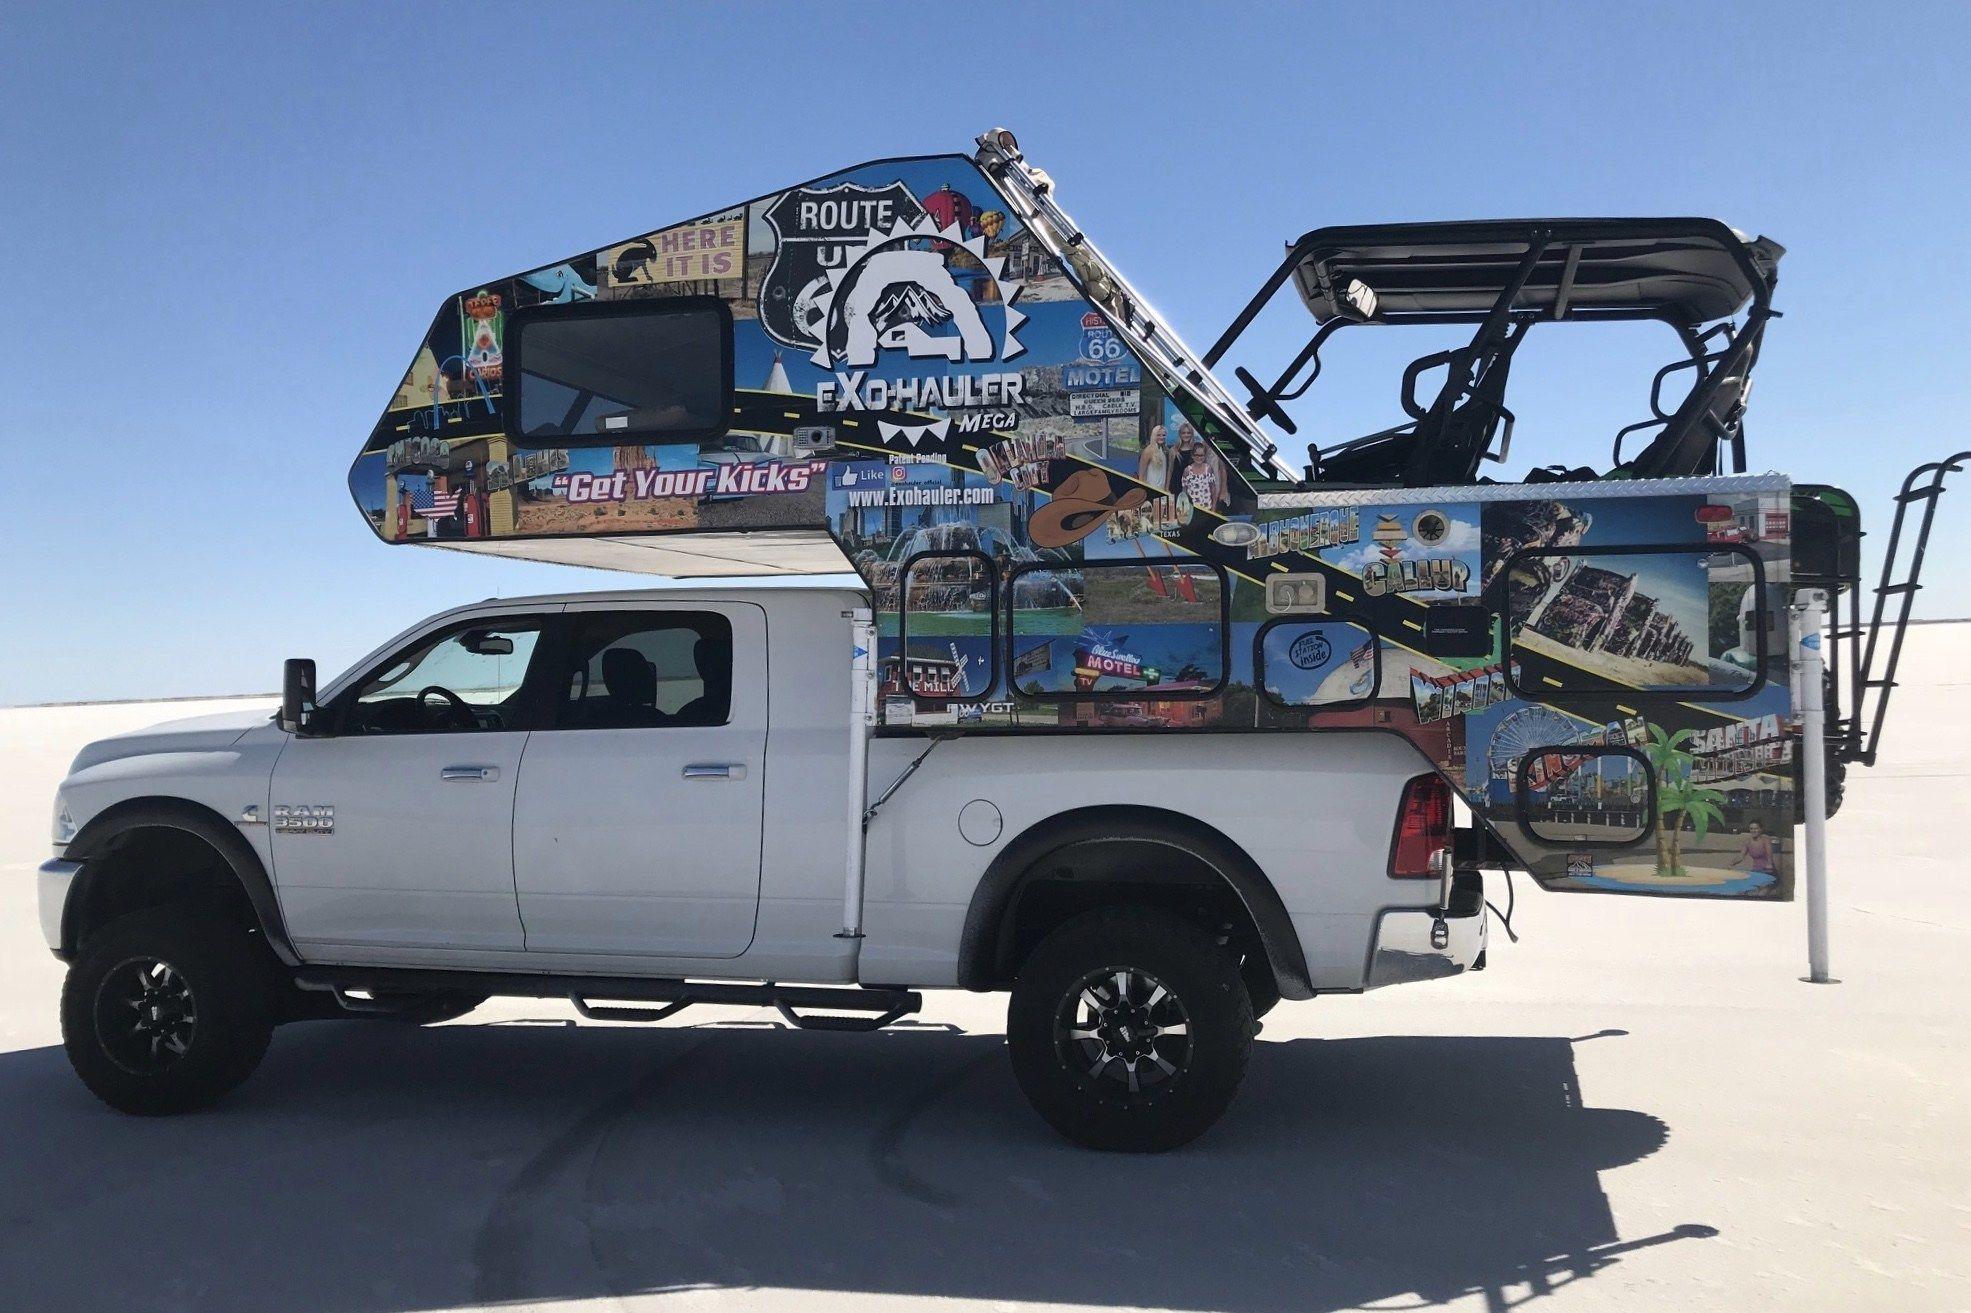 Exohaul Reveals Revolutionary Toy Hauler Truck Camper Truck